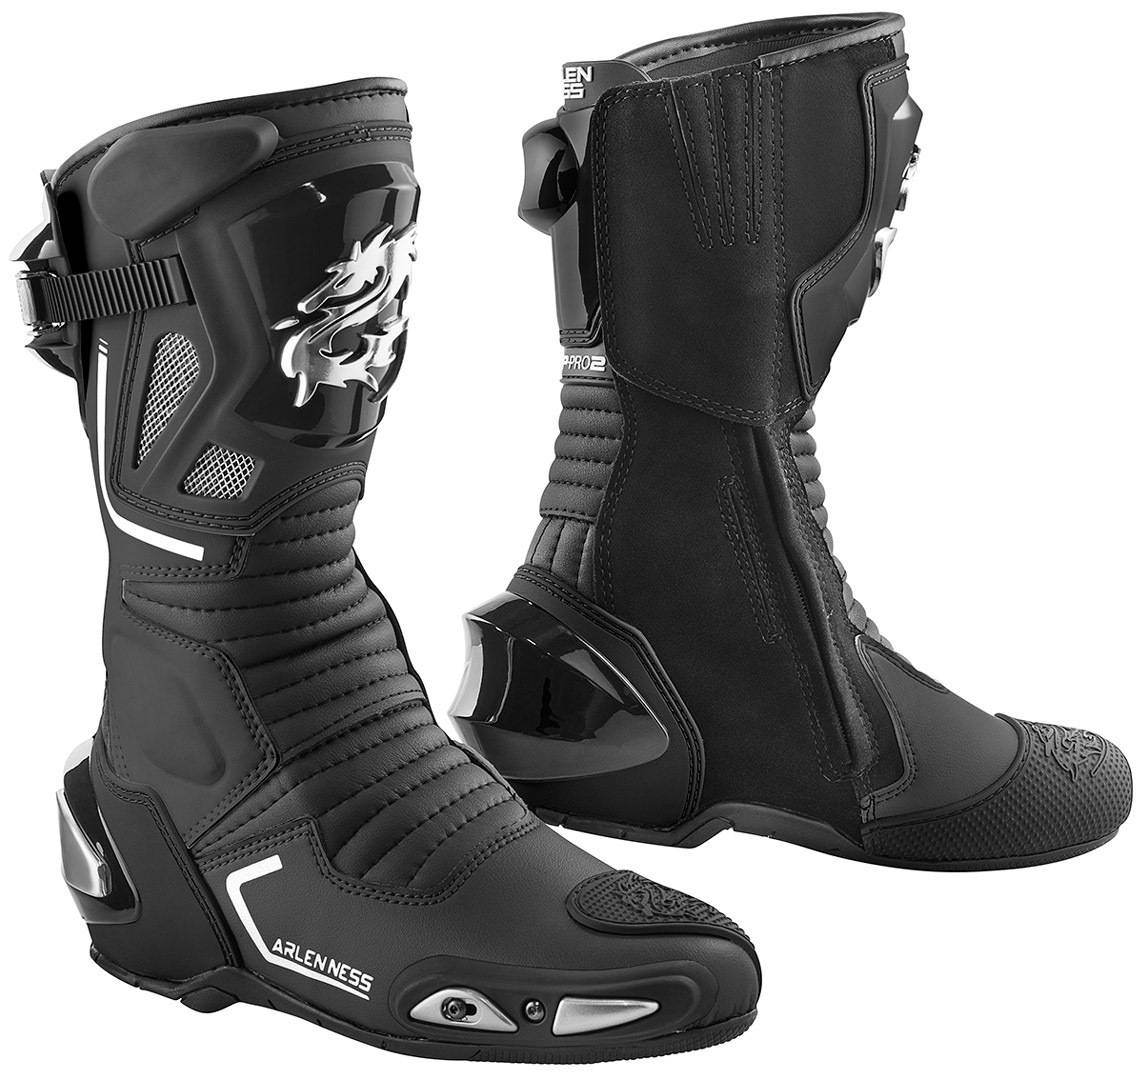 Arlen Ness Sugello Bottes de moto Noir taille : 45